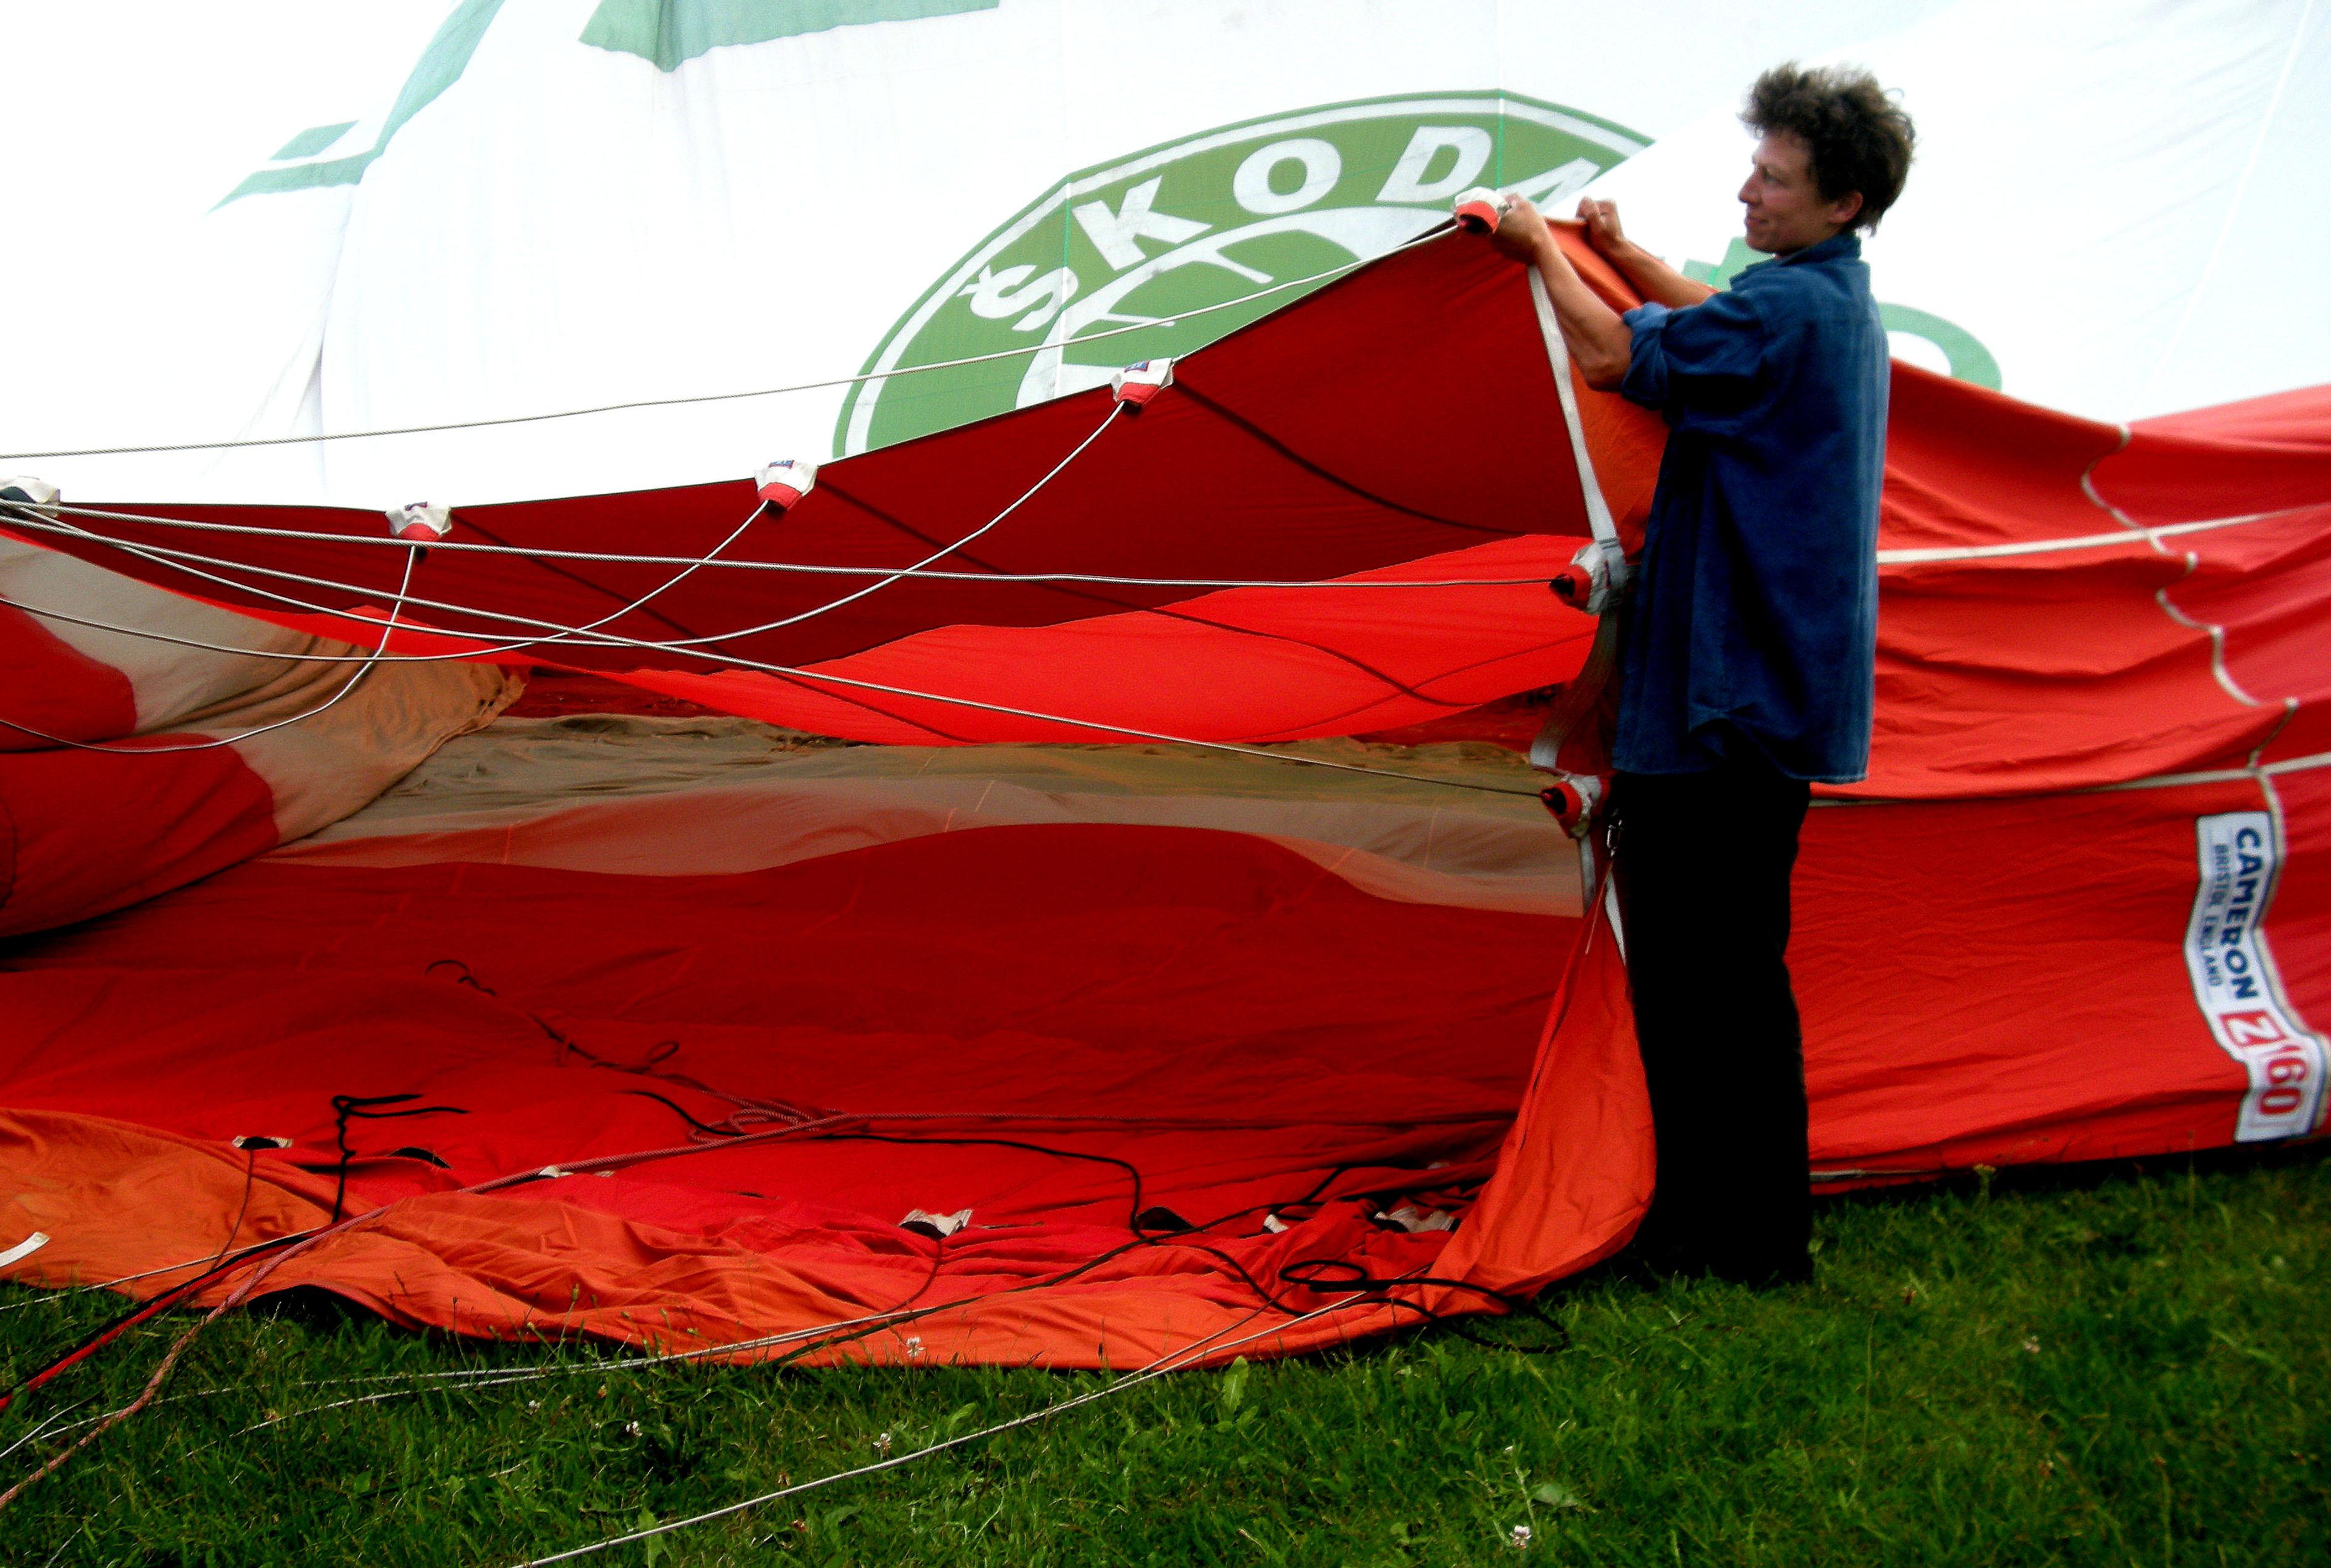 Anheben der Ballonöffnung